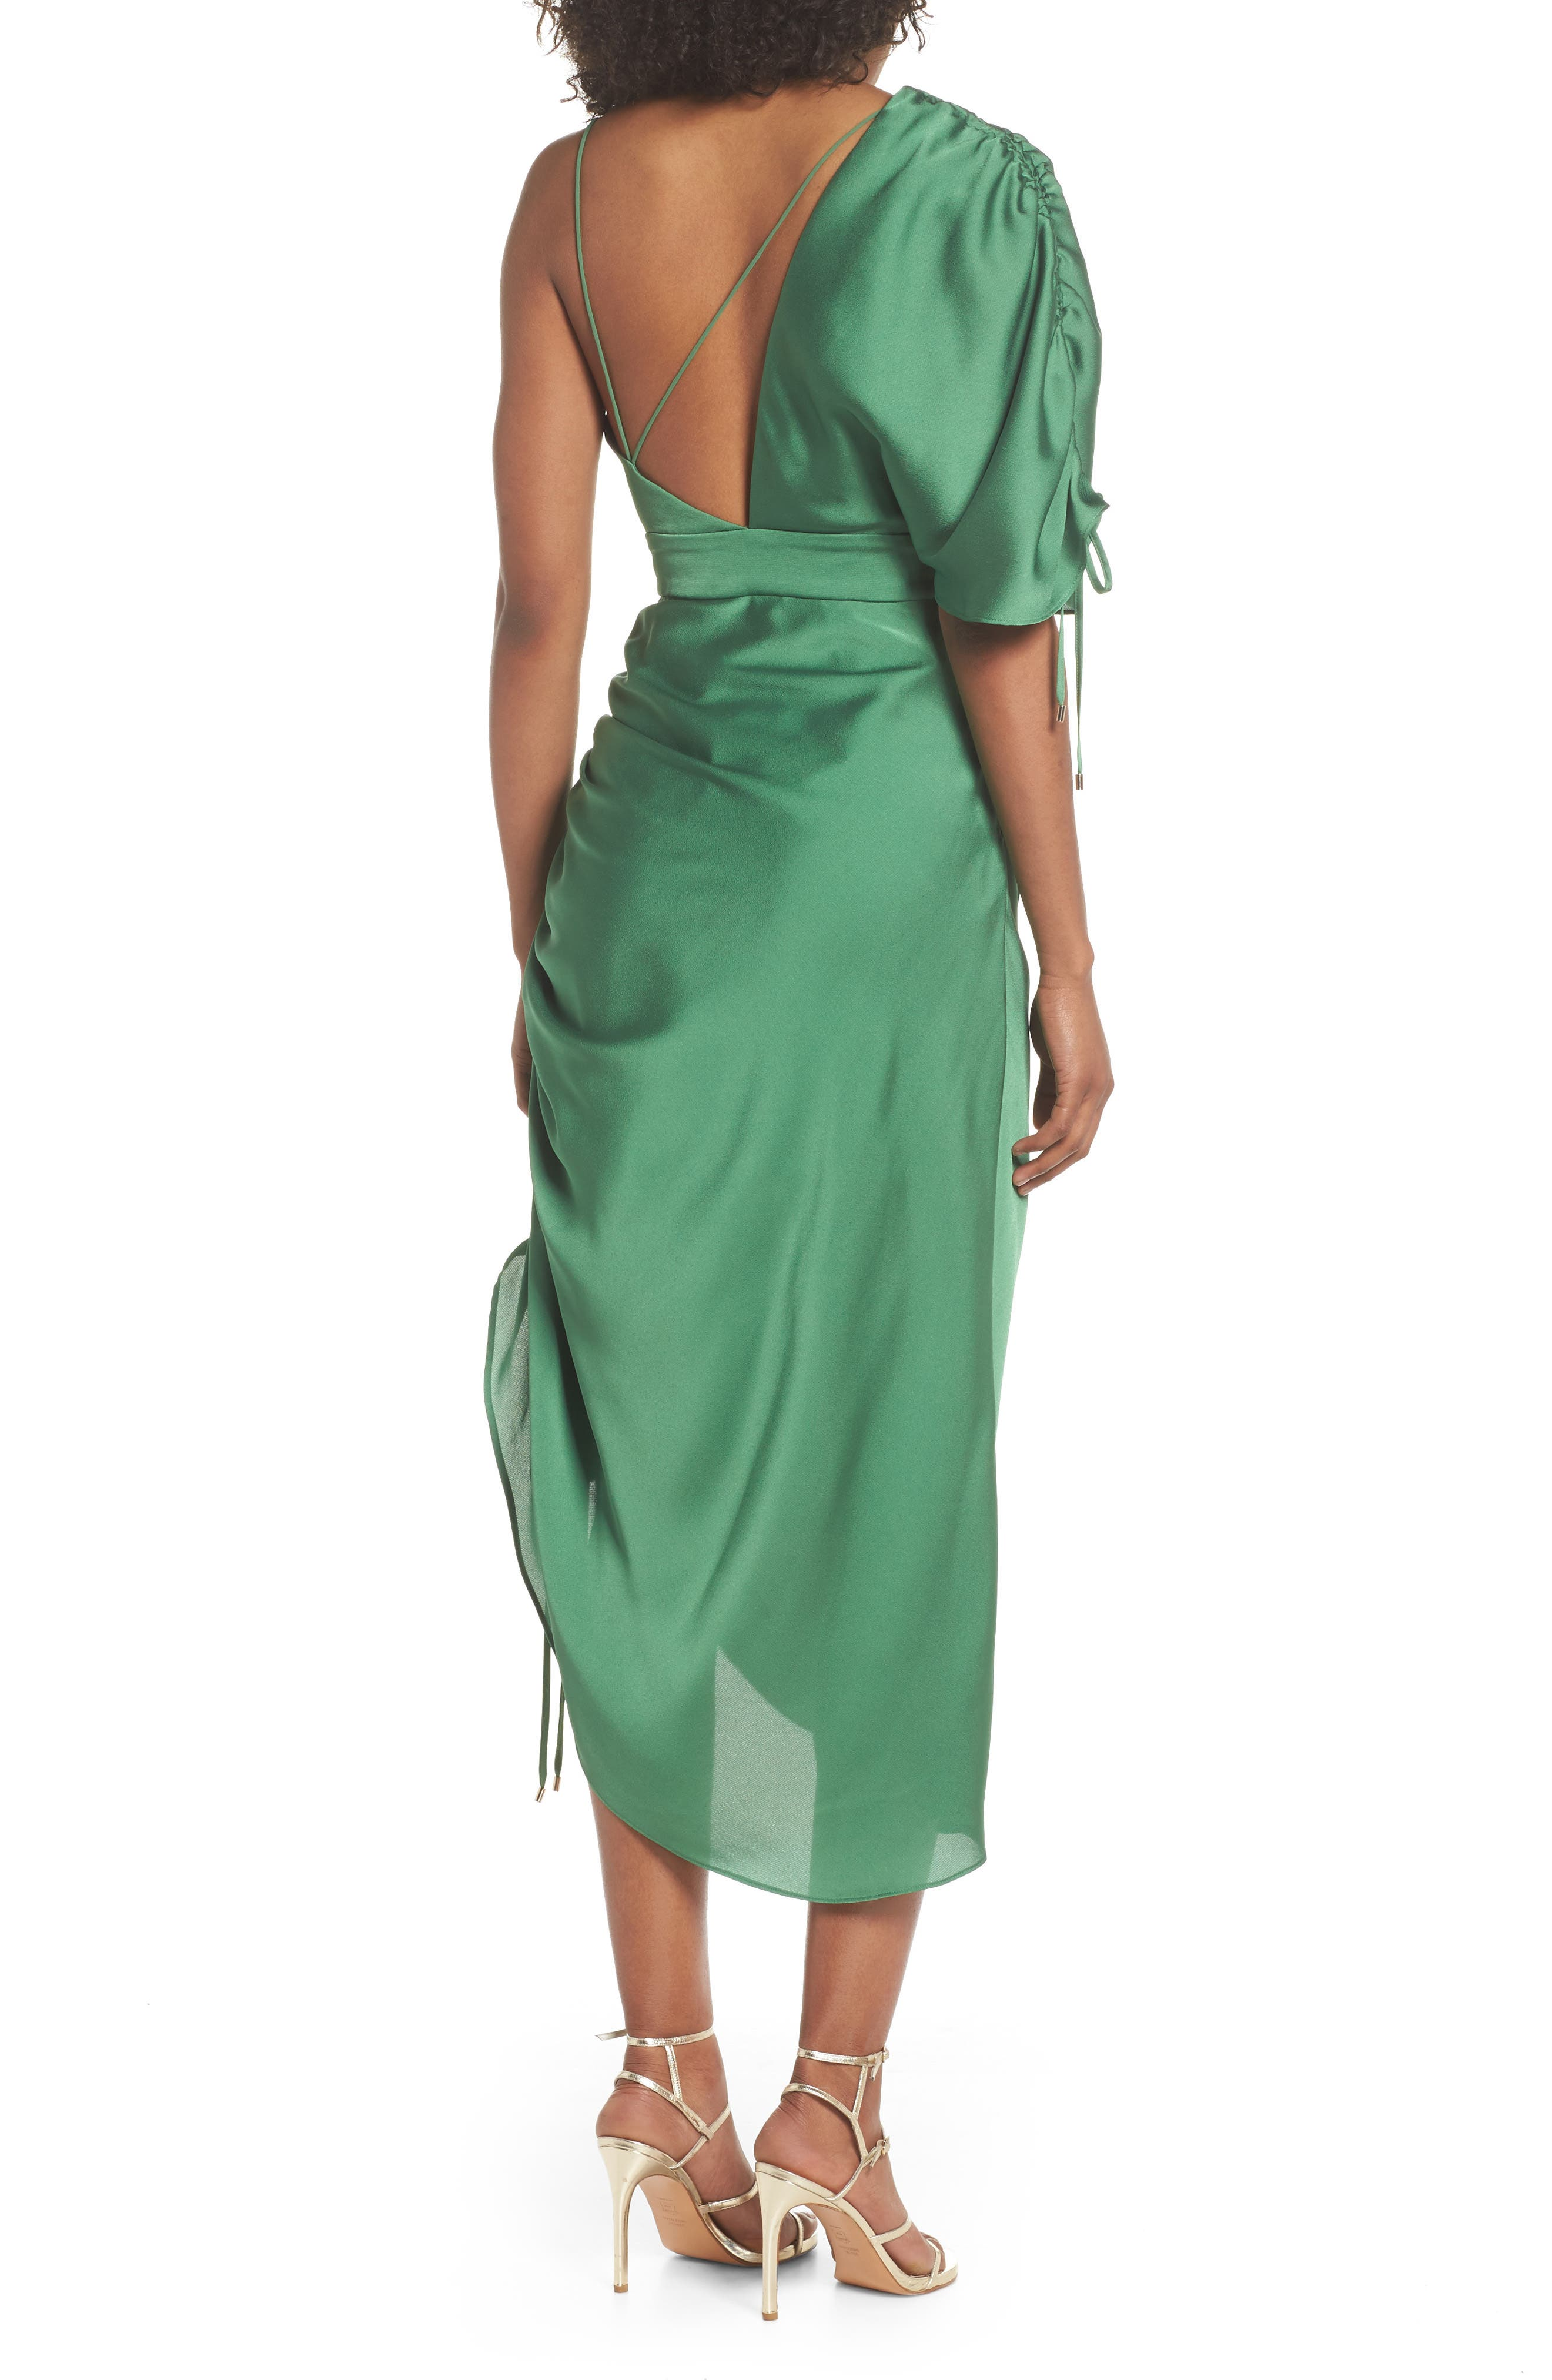 I've Got You Asymmetrical Satin Dress,                             Alternate thumbnail 2, color,                             310